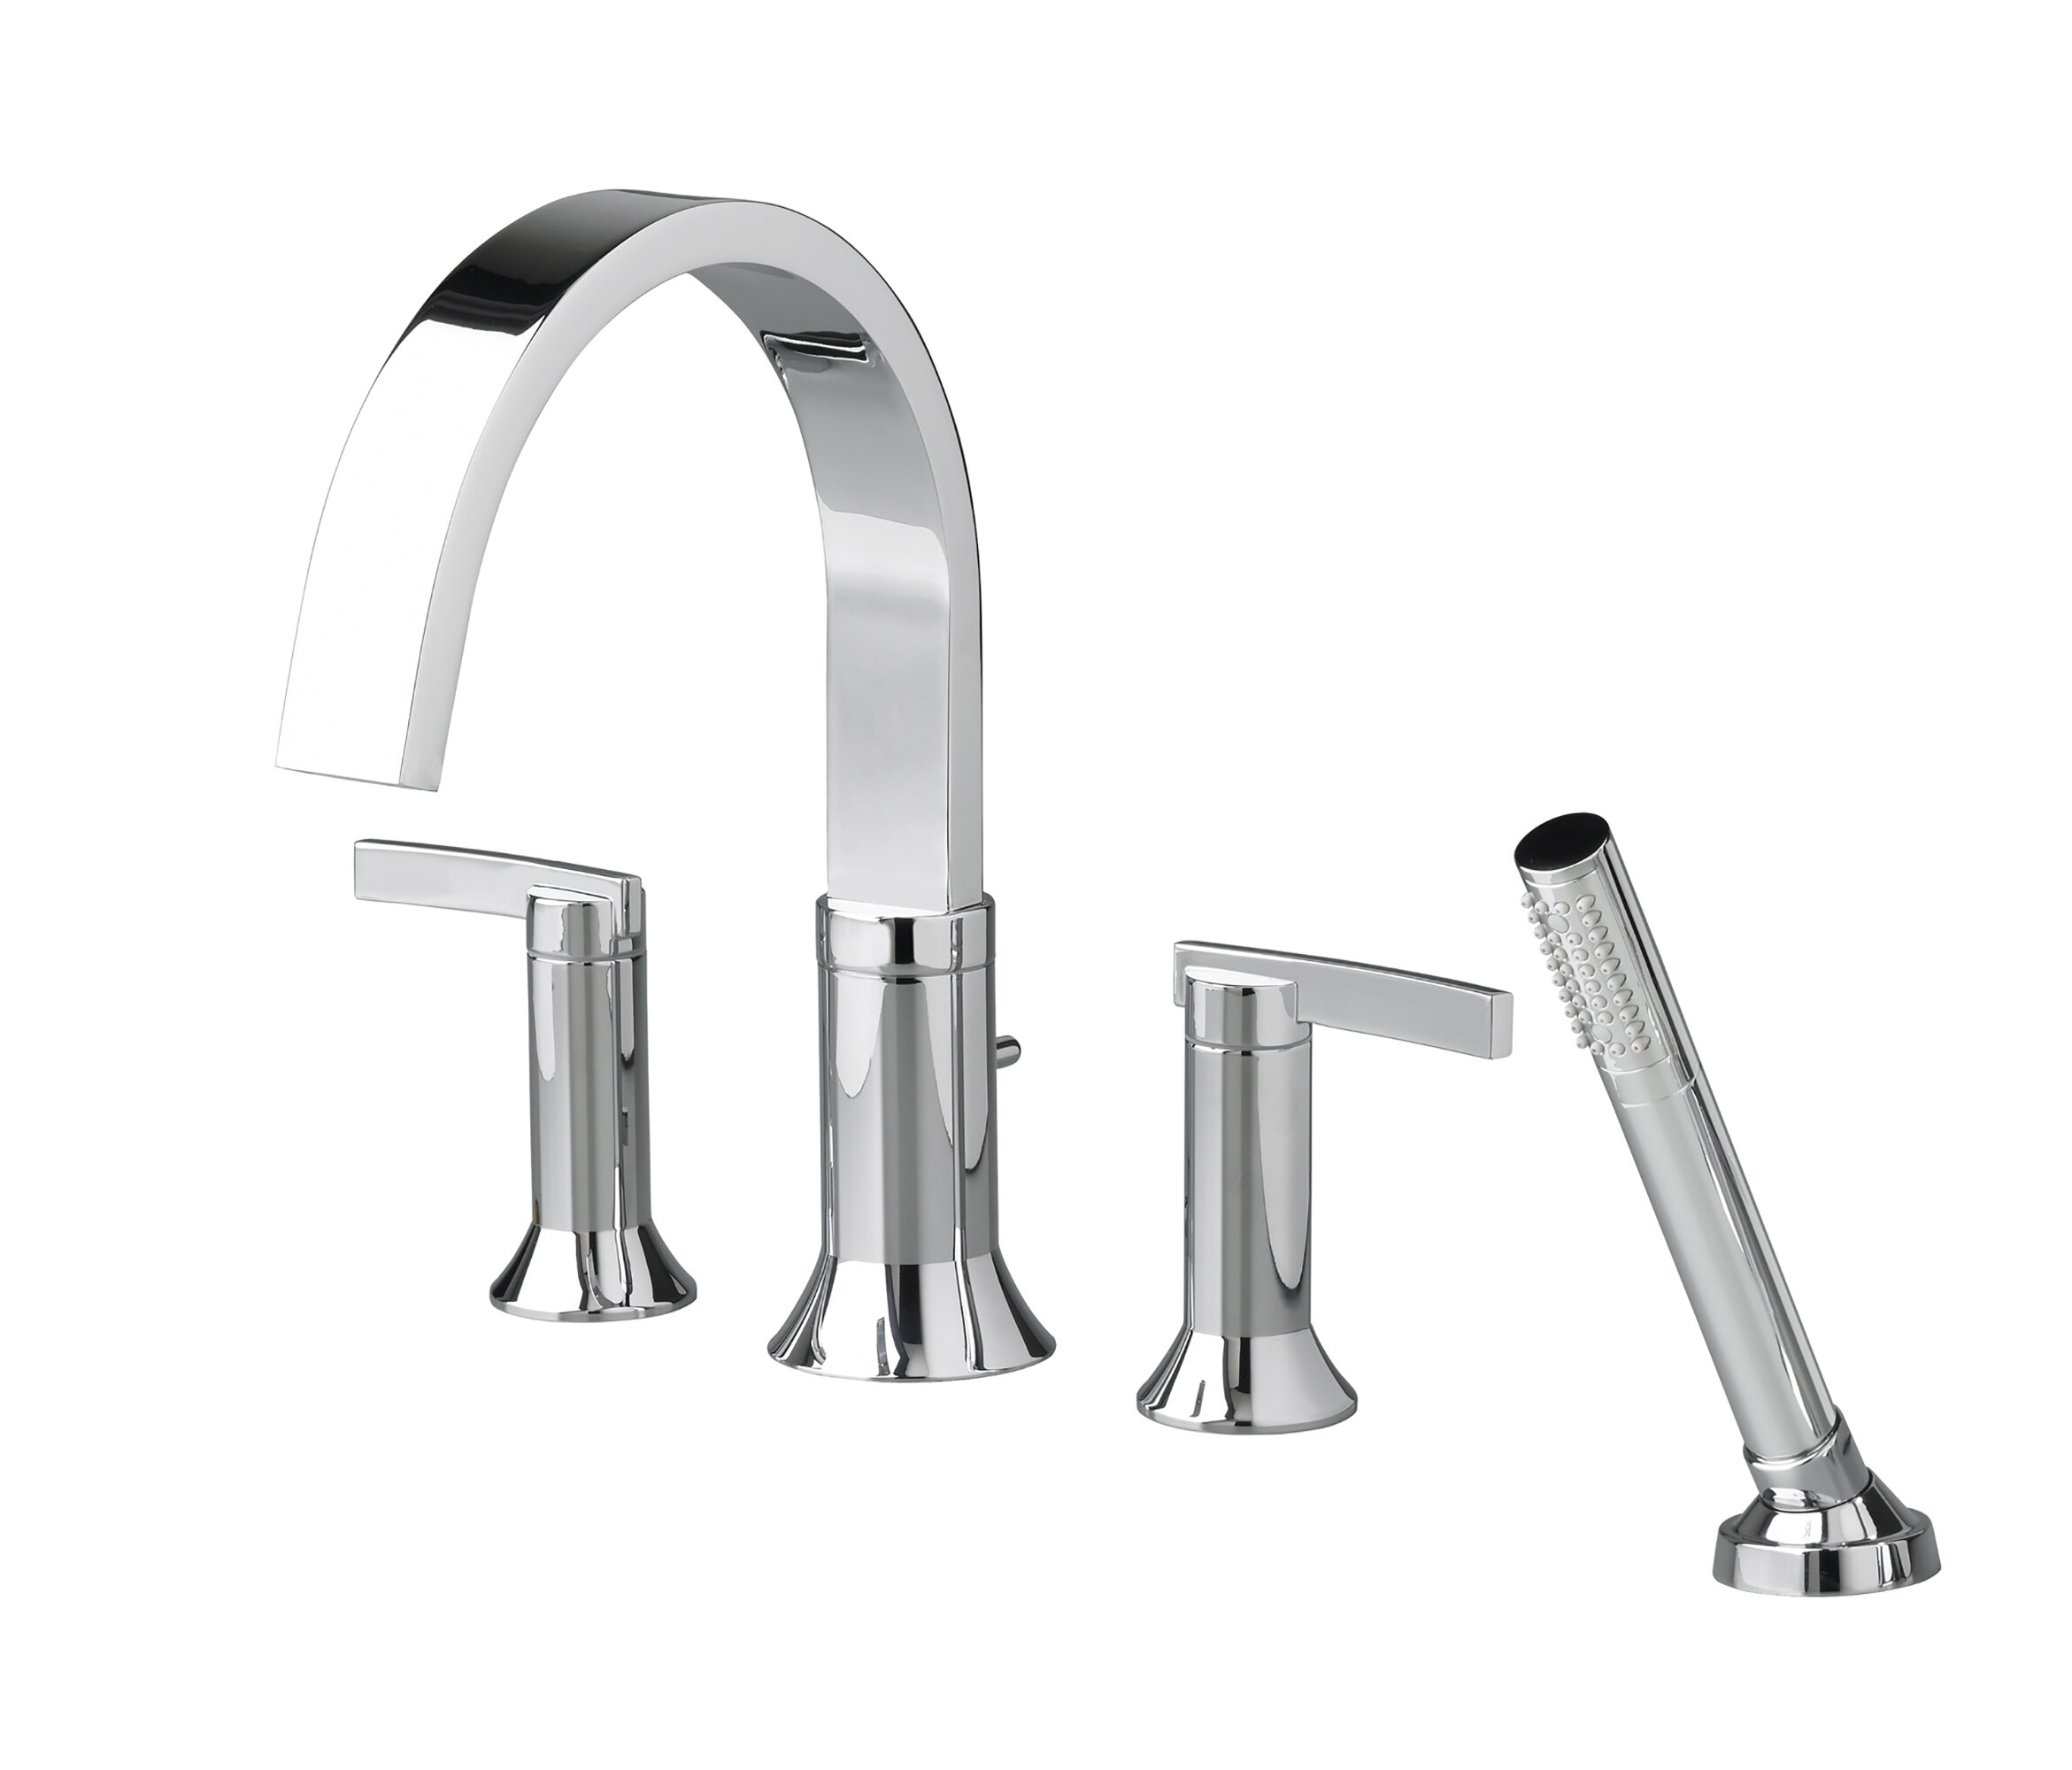 American Standard Berwick Double Handle Deck Mounted Roman Tub Faucet Trim With Diverter And Handshower Wayfair